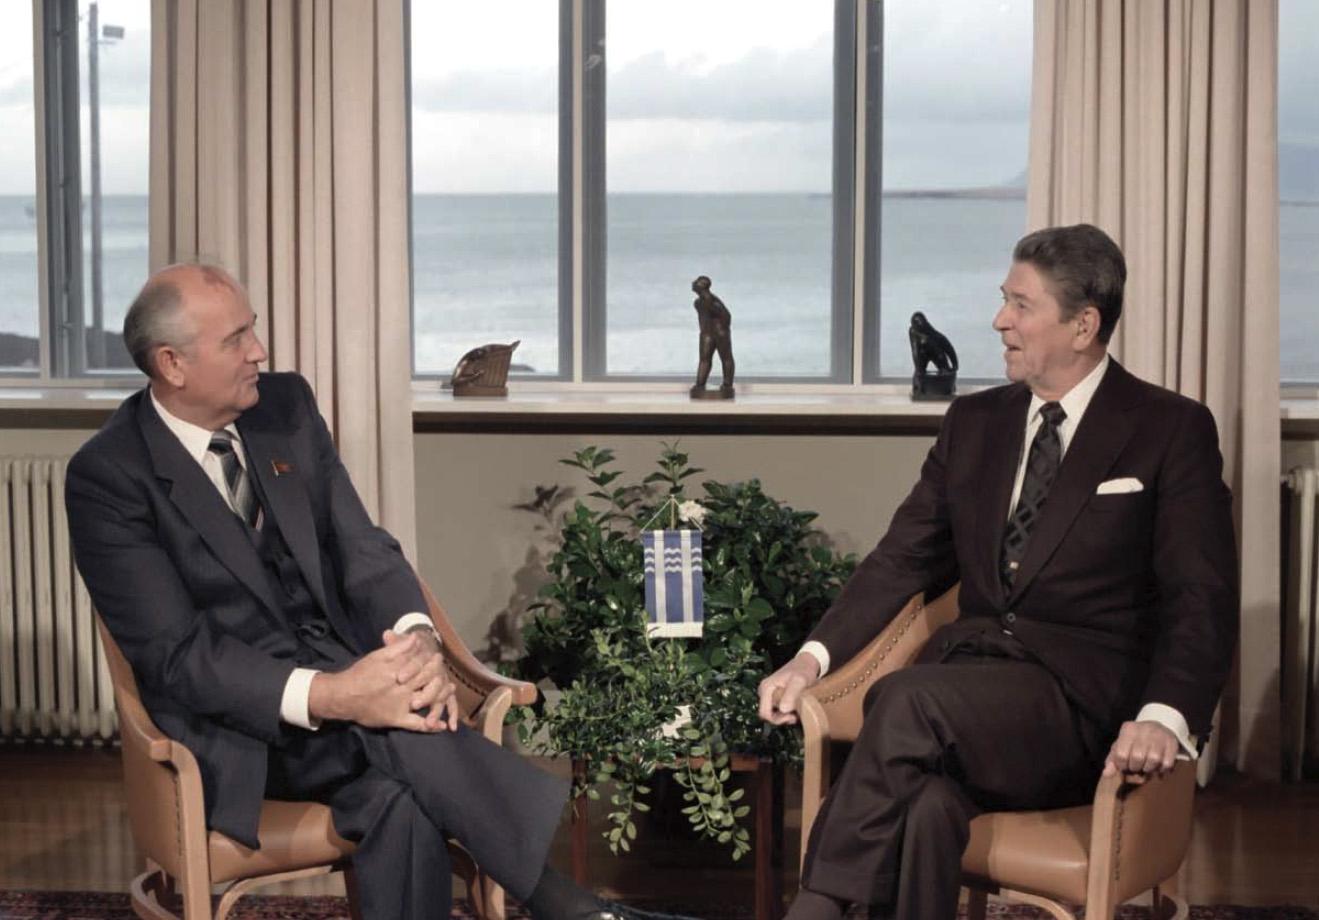 President Reagan meeting with Soviet General Secretary Gorbachev at Hofdi House during the Reykjavik Summit in Iceland on October 11, 1986.